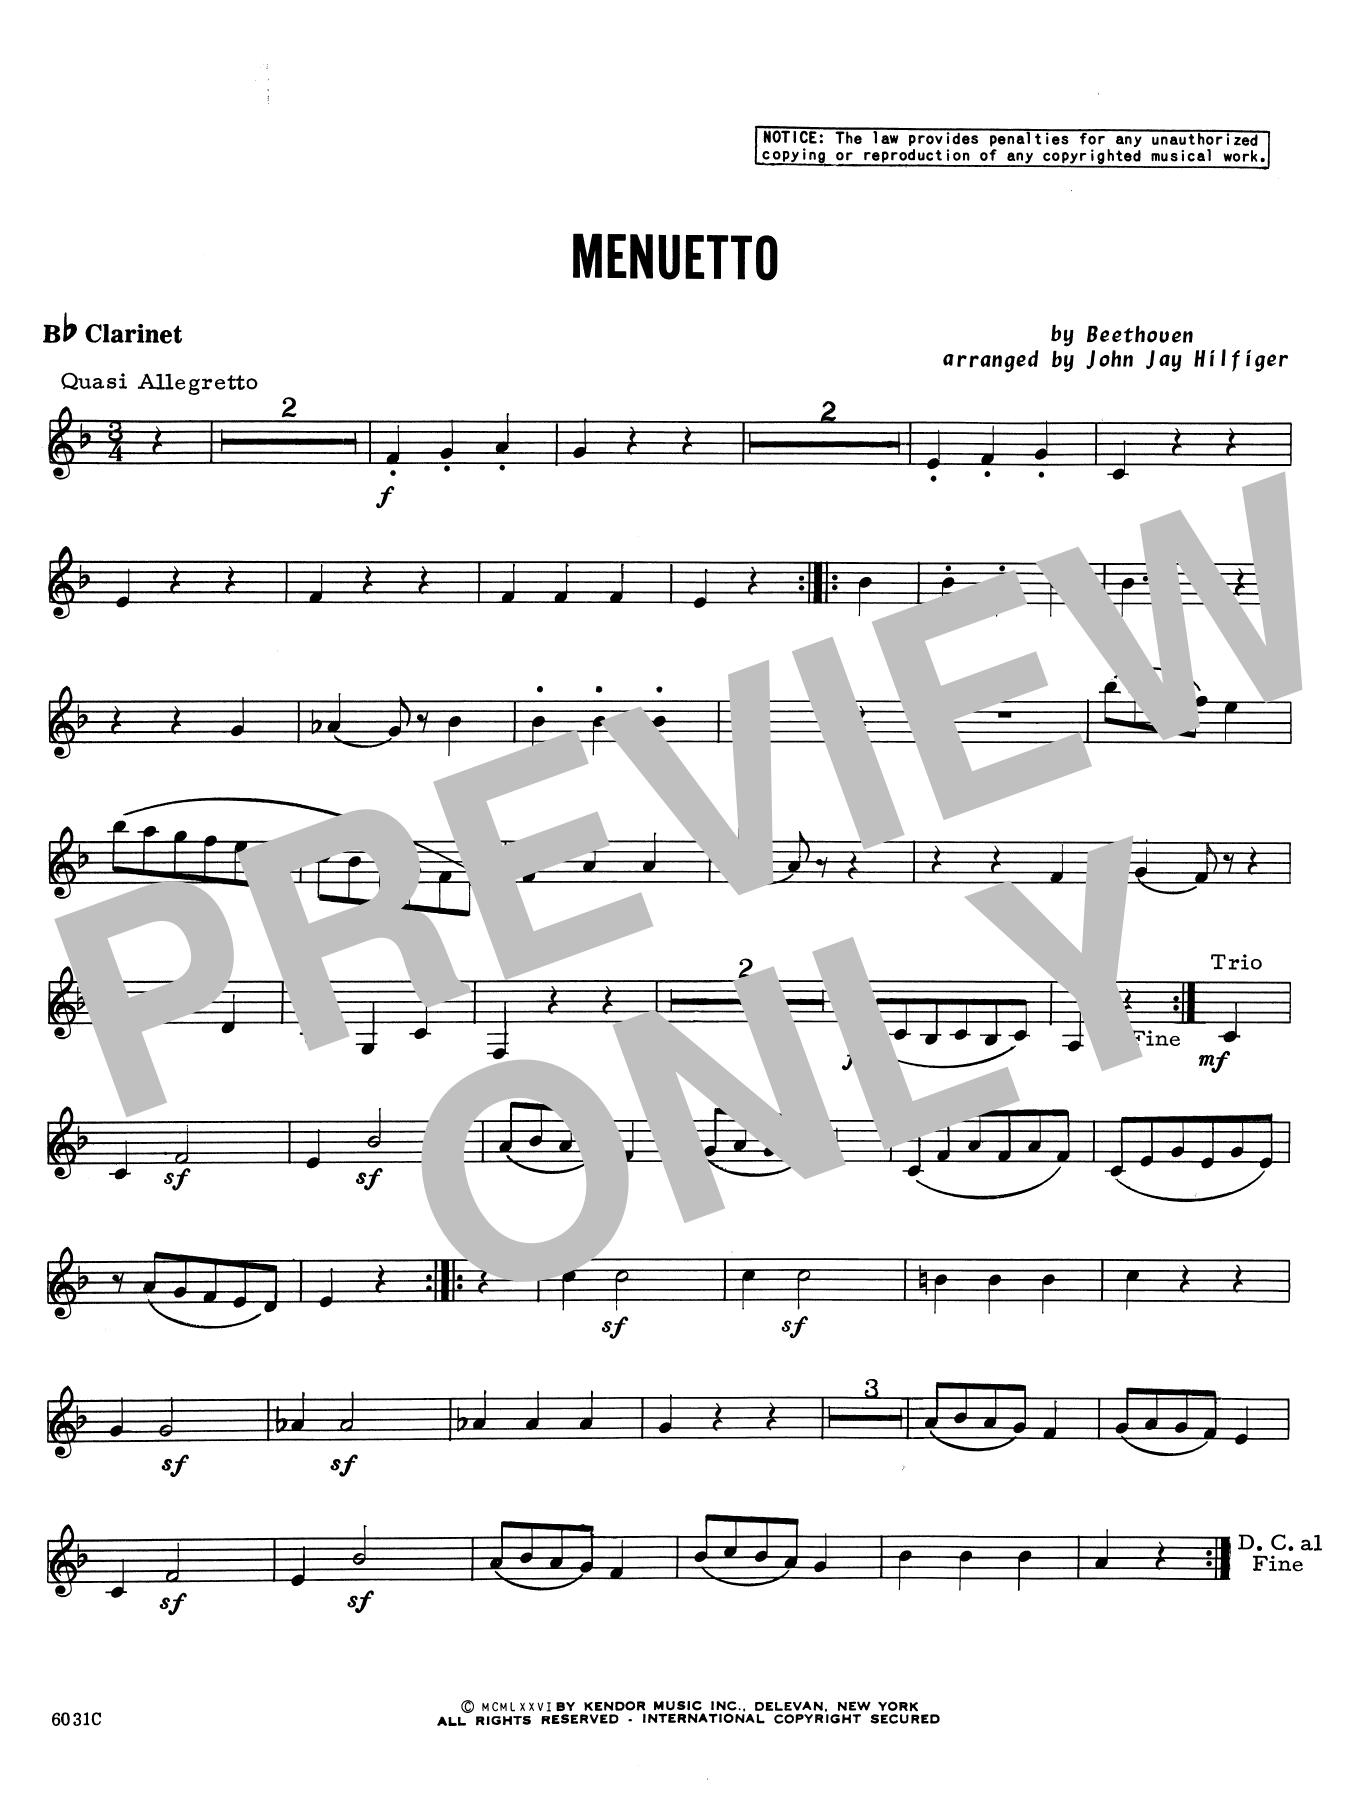 Menuetto - Bb Clarinet Sheet Music